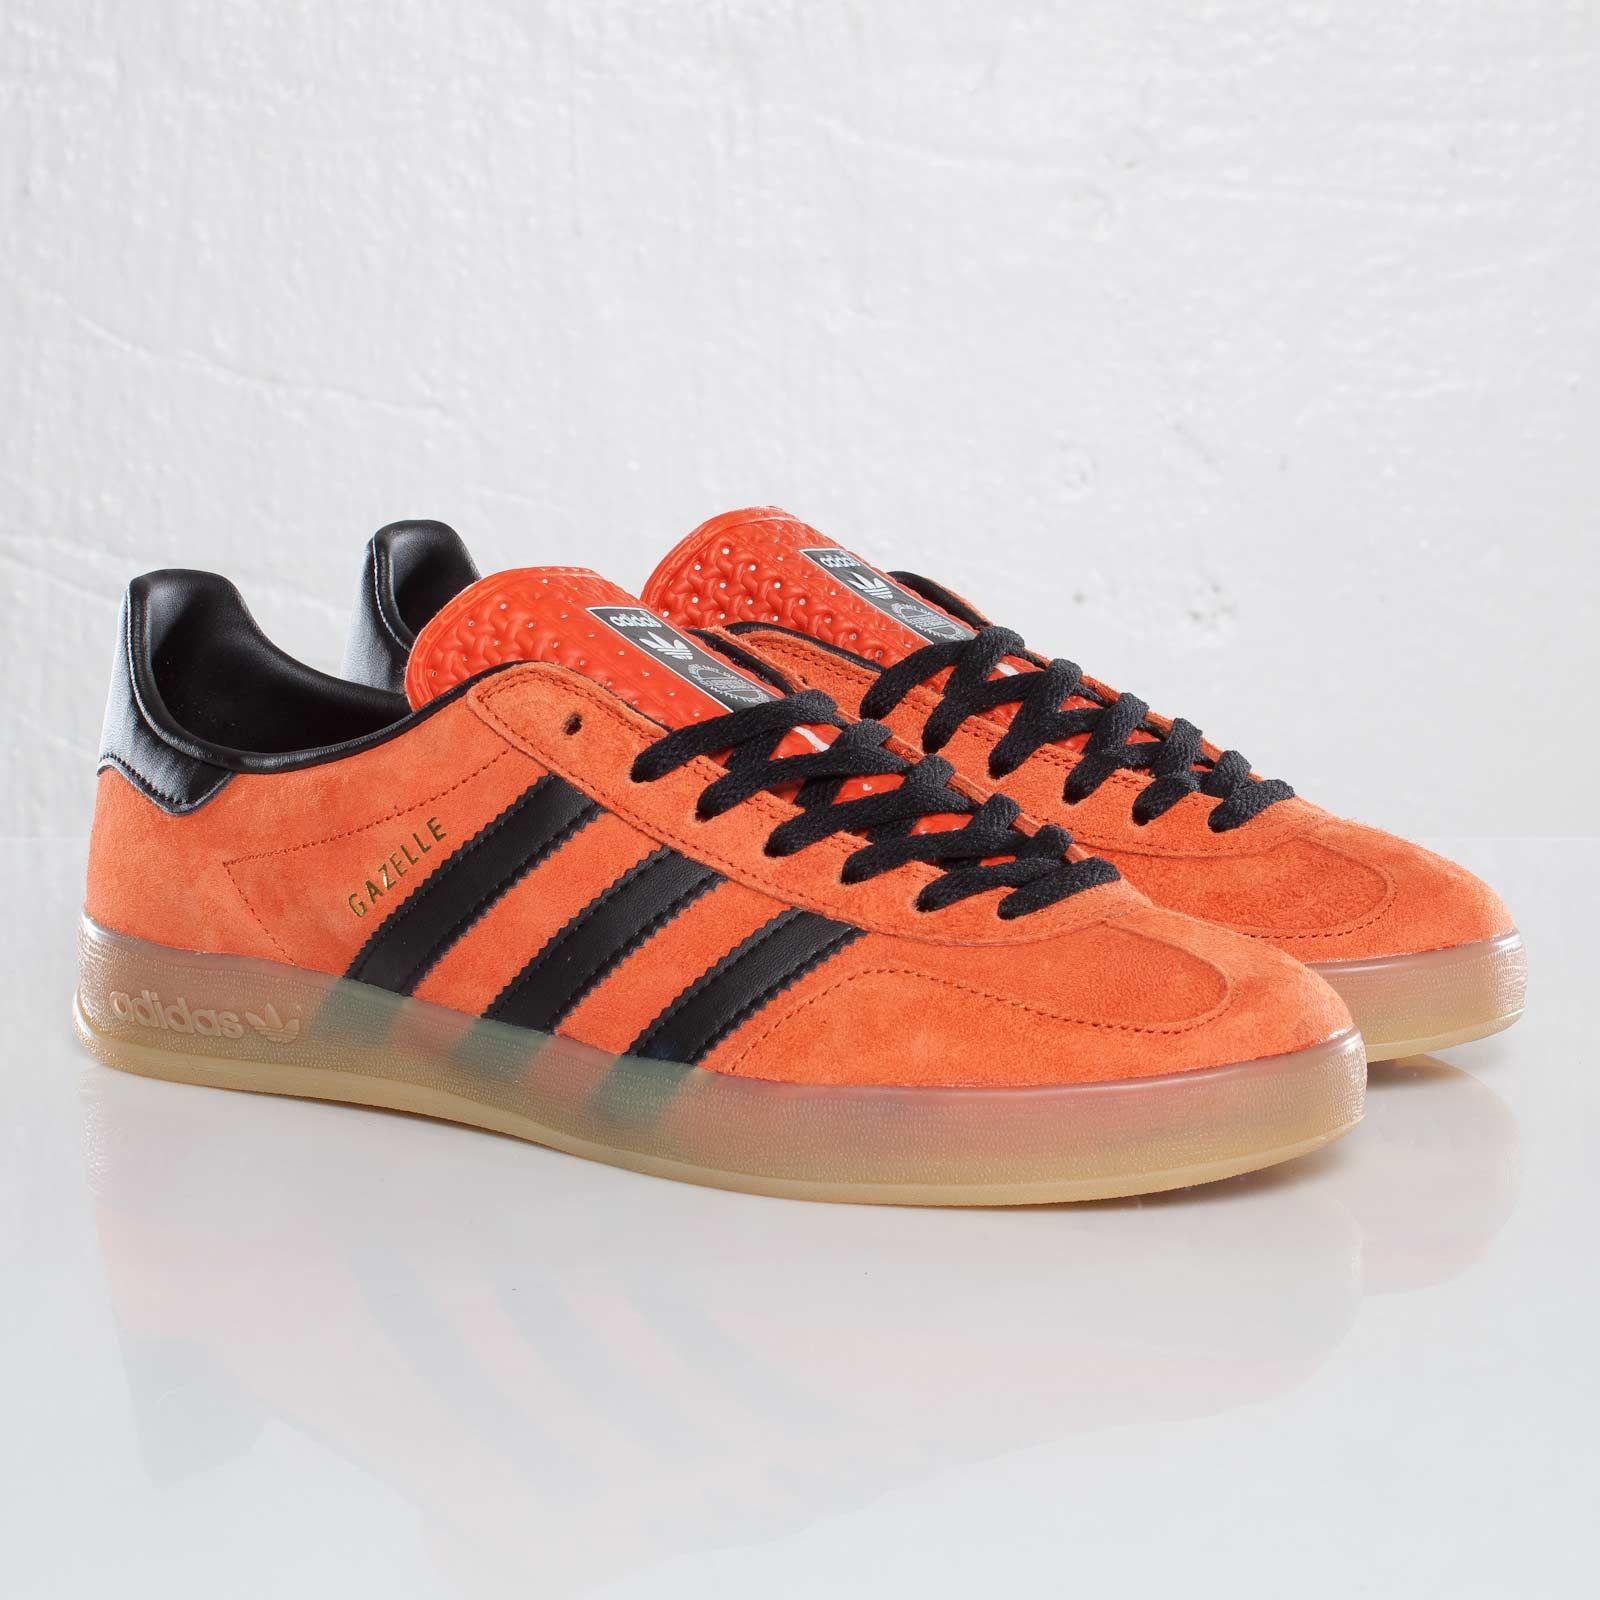 Adidas Originals Gazelle Indoor | Sneakers men fashion, Sneakers ...